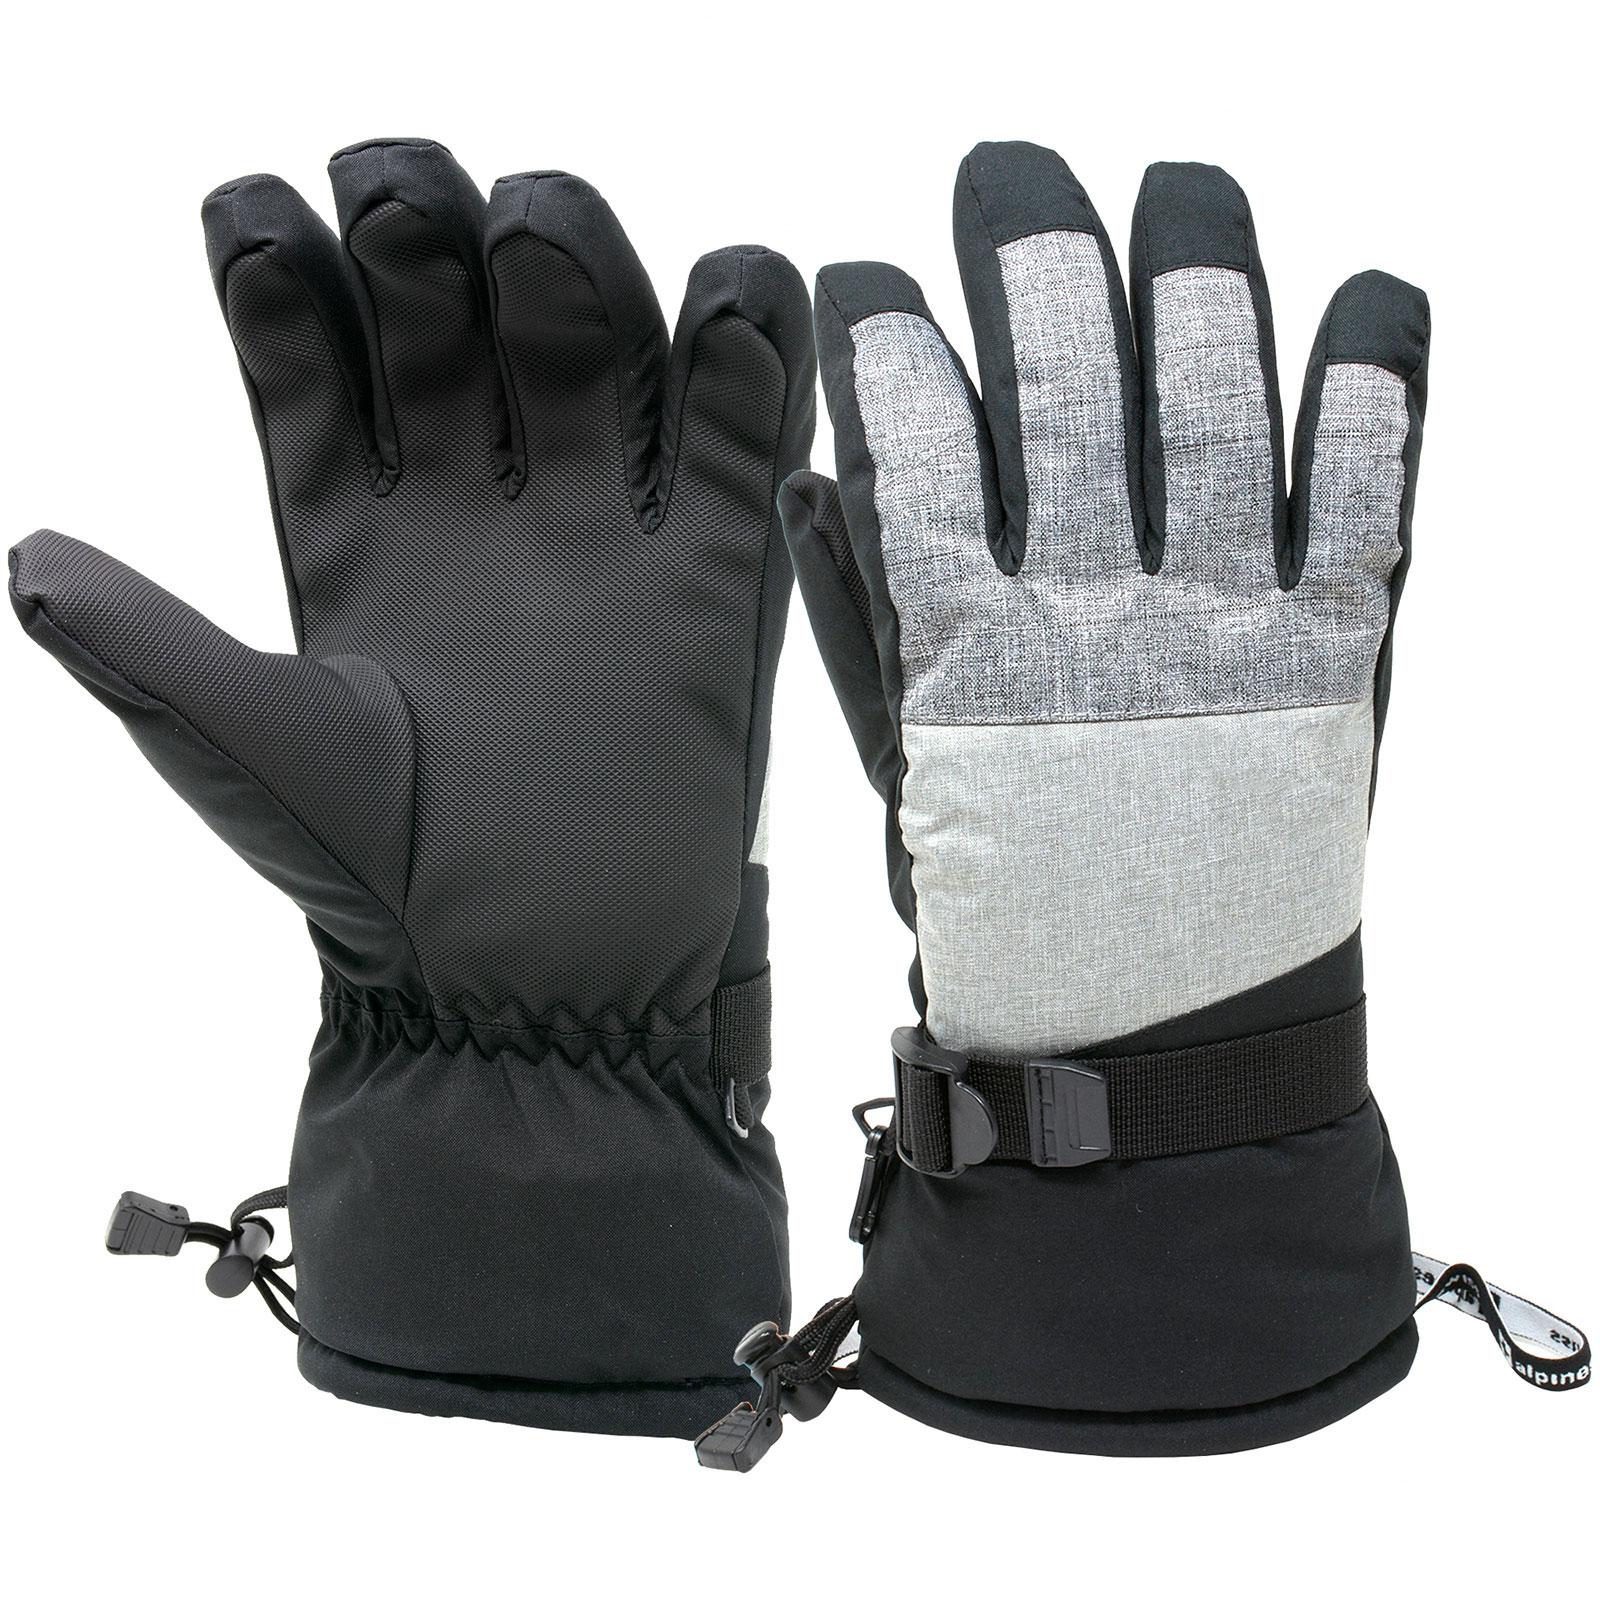 alpine-swiss-mens-waterproof-ski-gloves